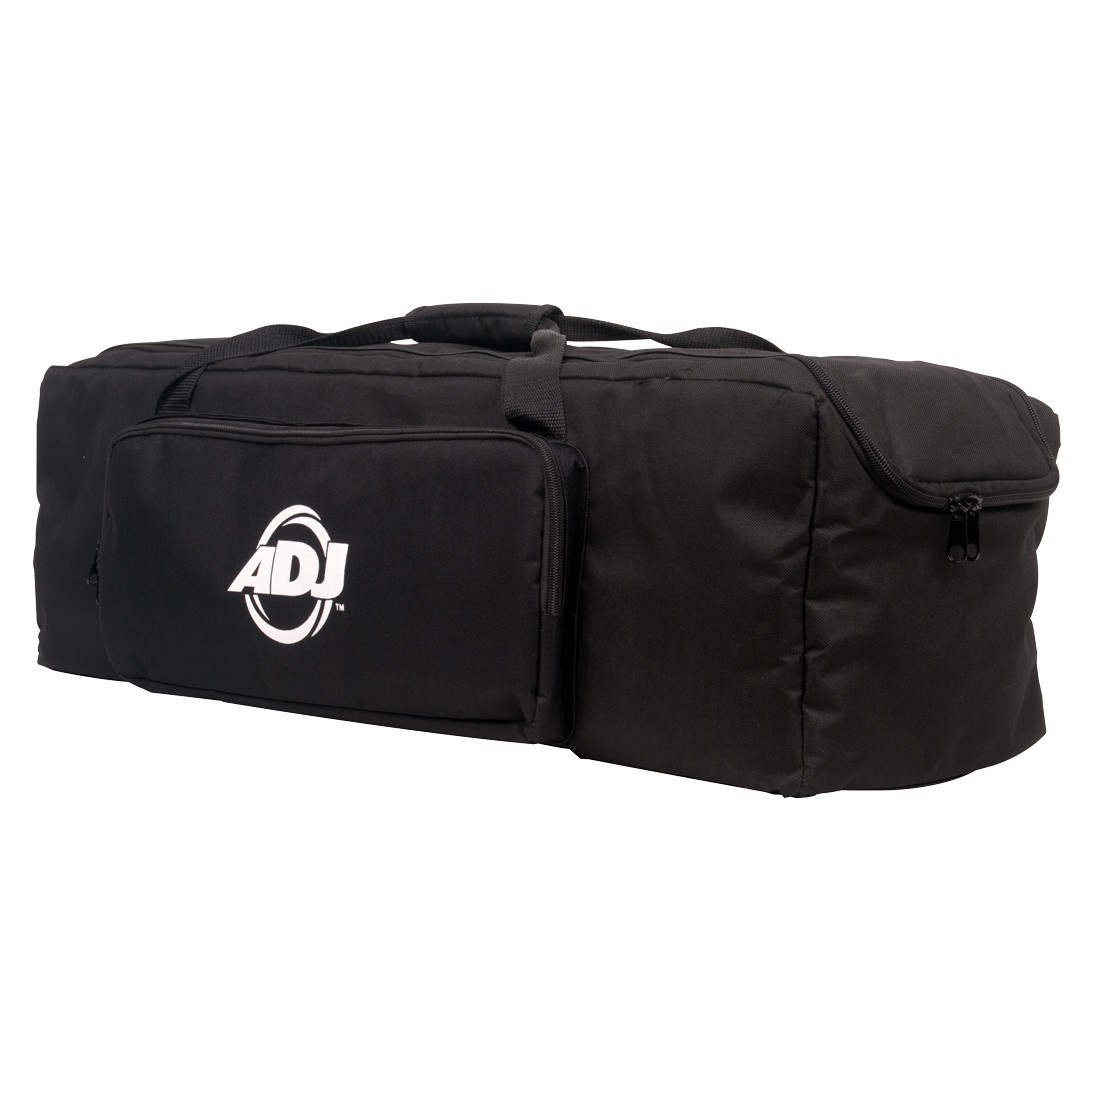 ADJ Flat Par Bag 8